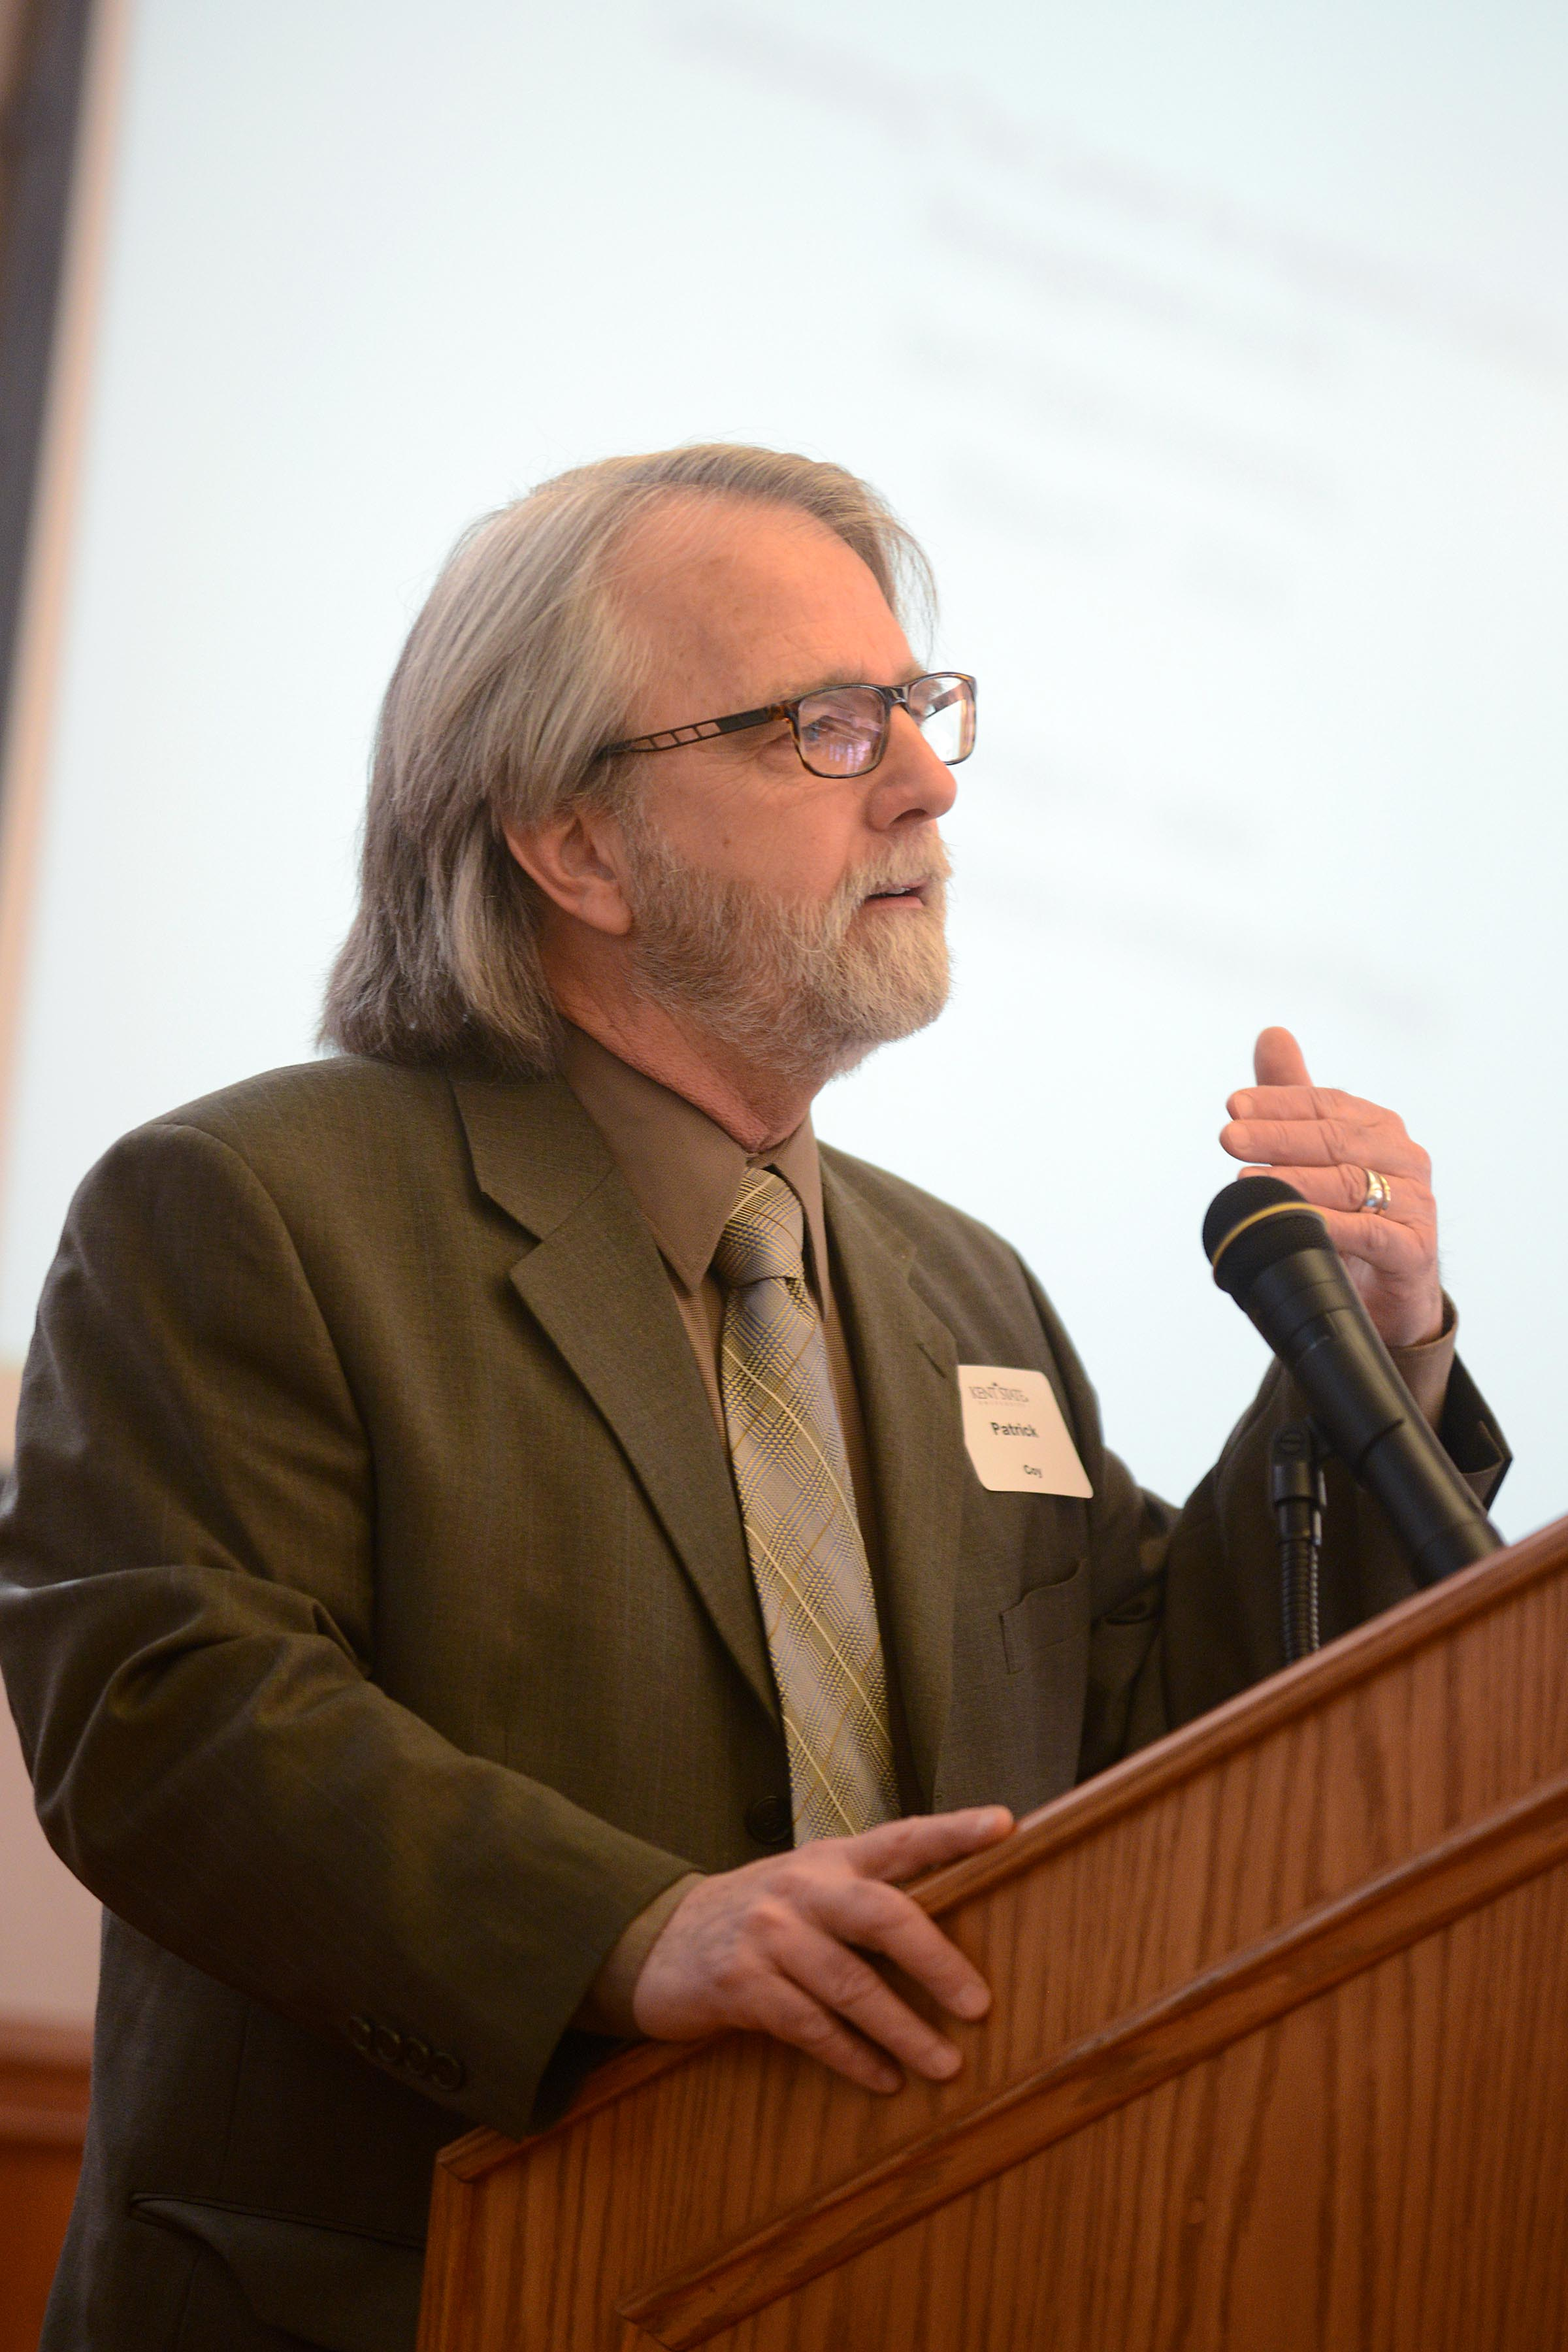 Dr. Patrick Coy